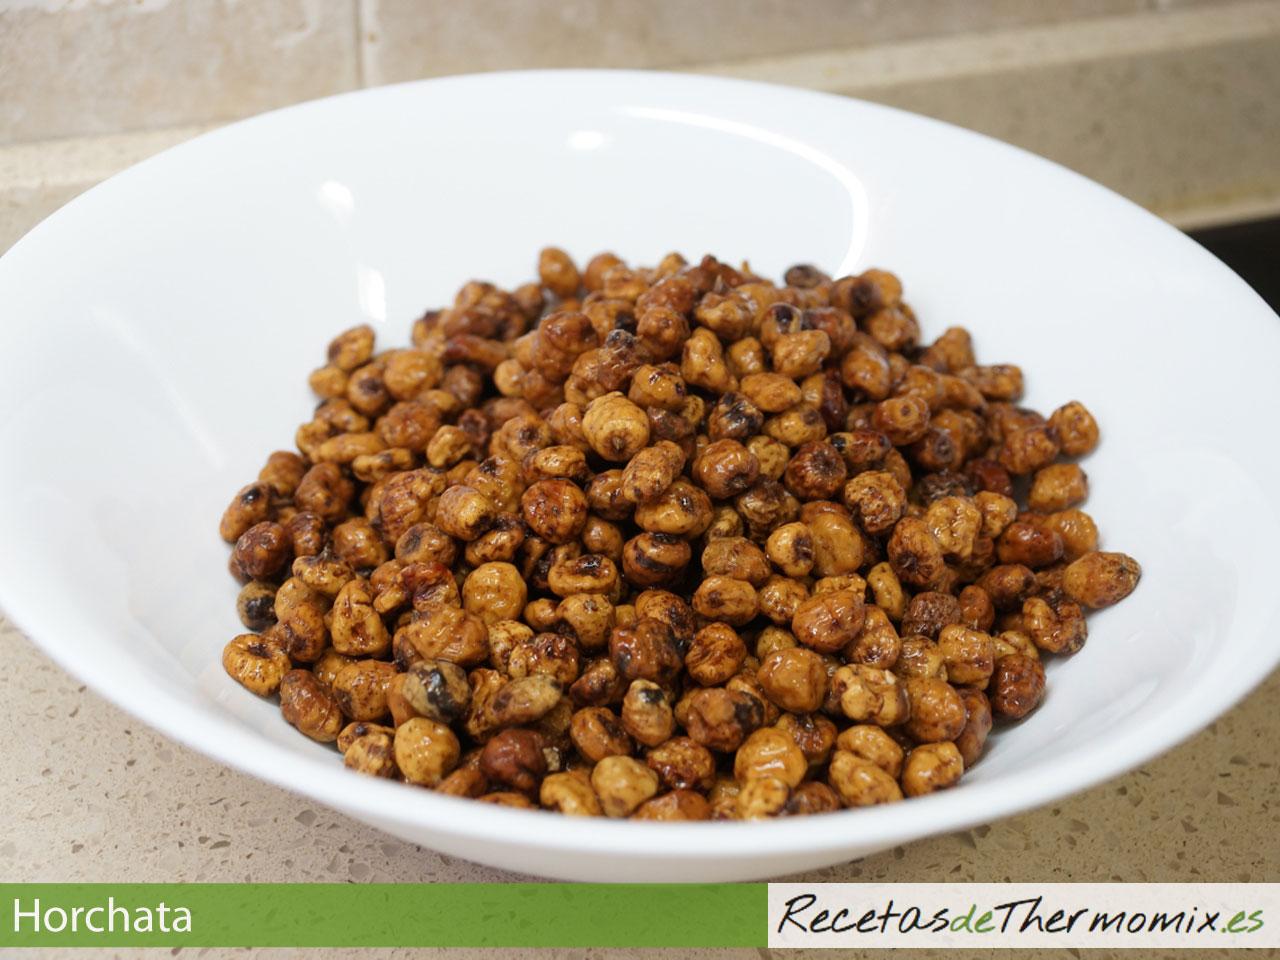 Chufas para hacer horchata